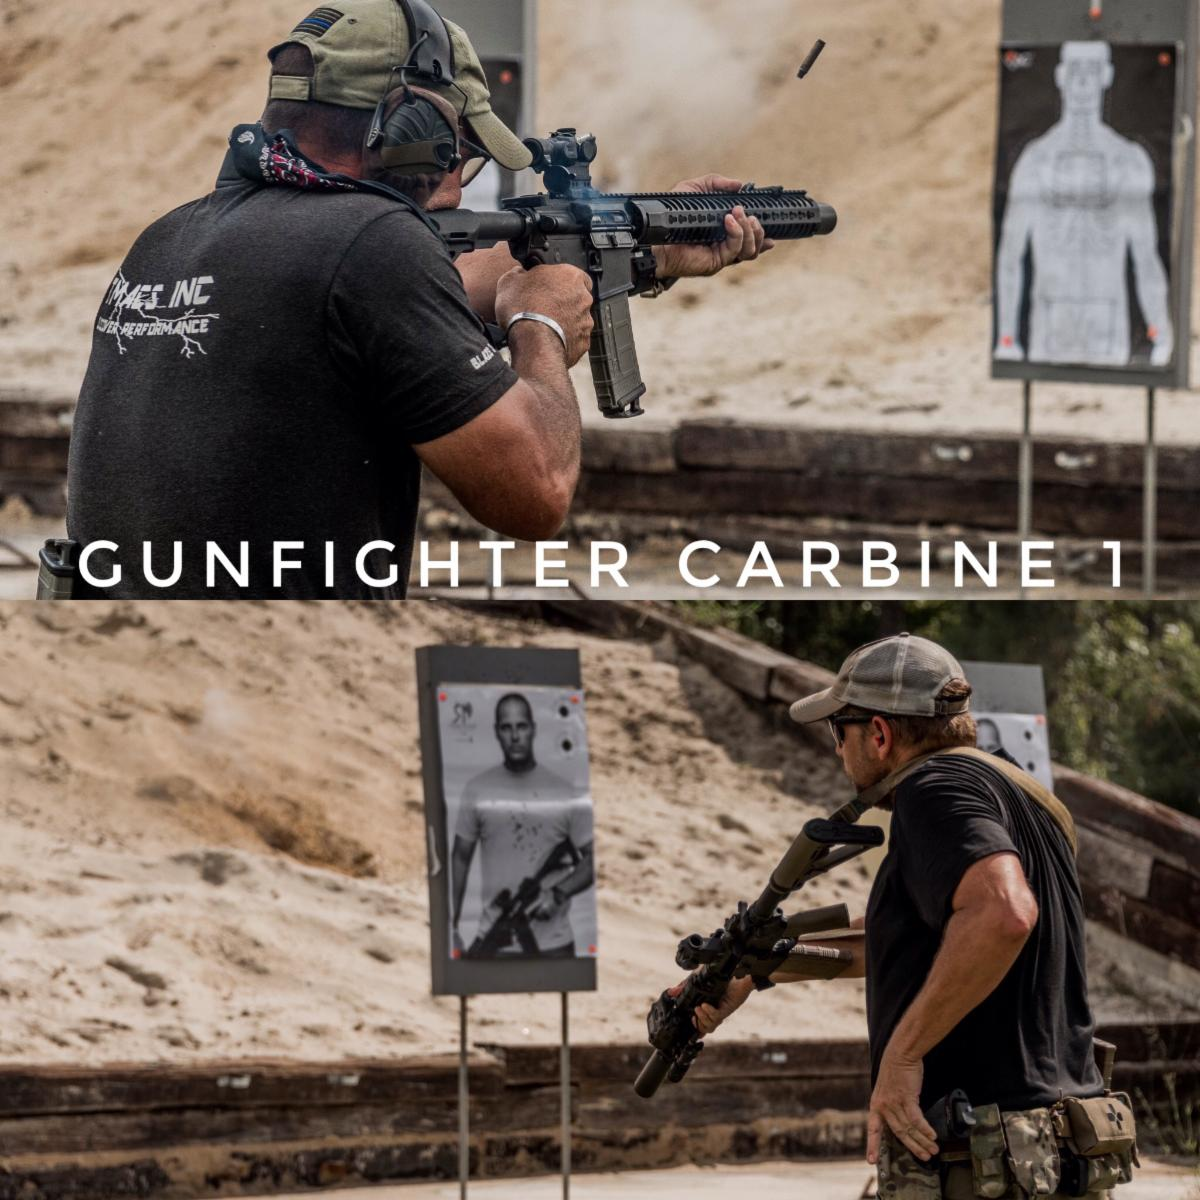 Gunfighter Carbine Training Phase 1